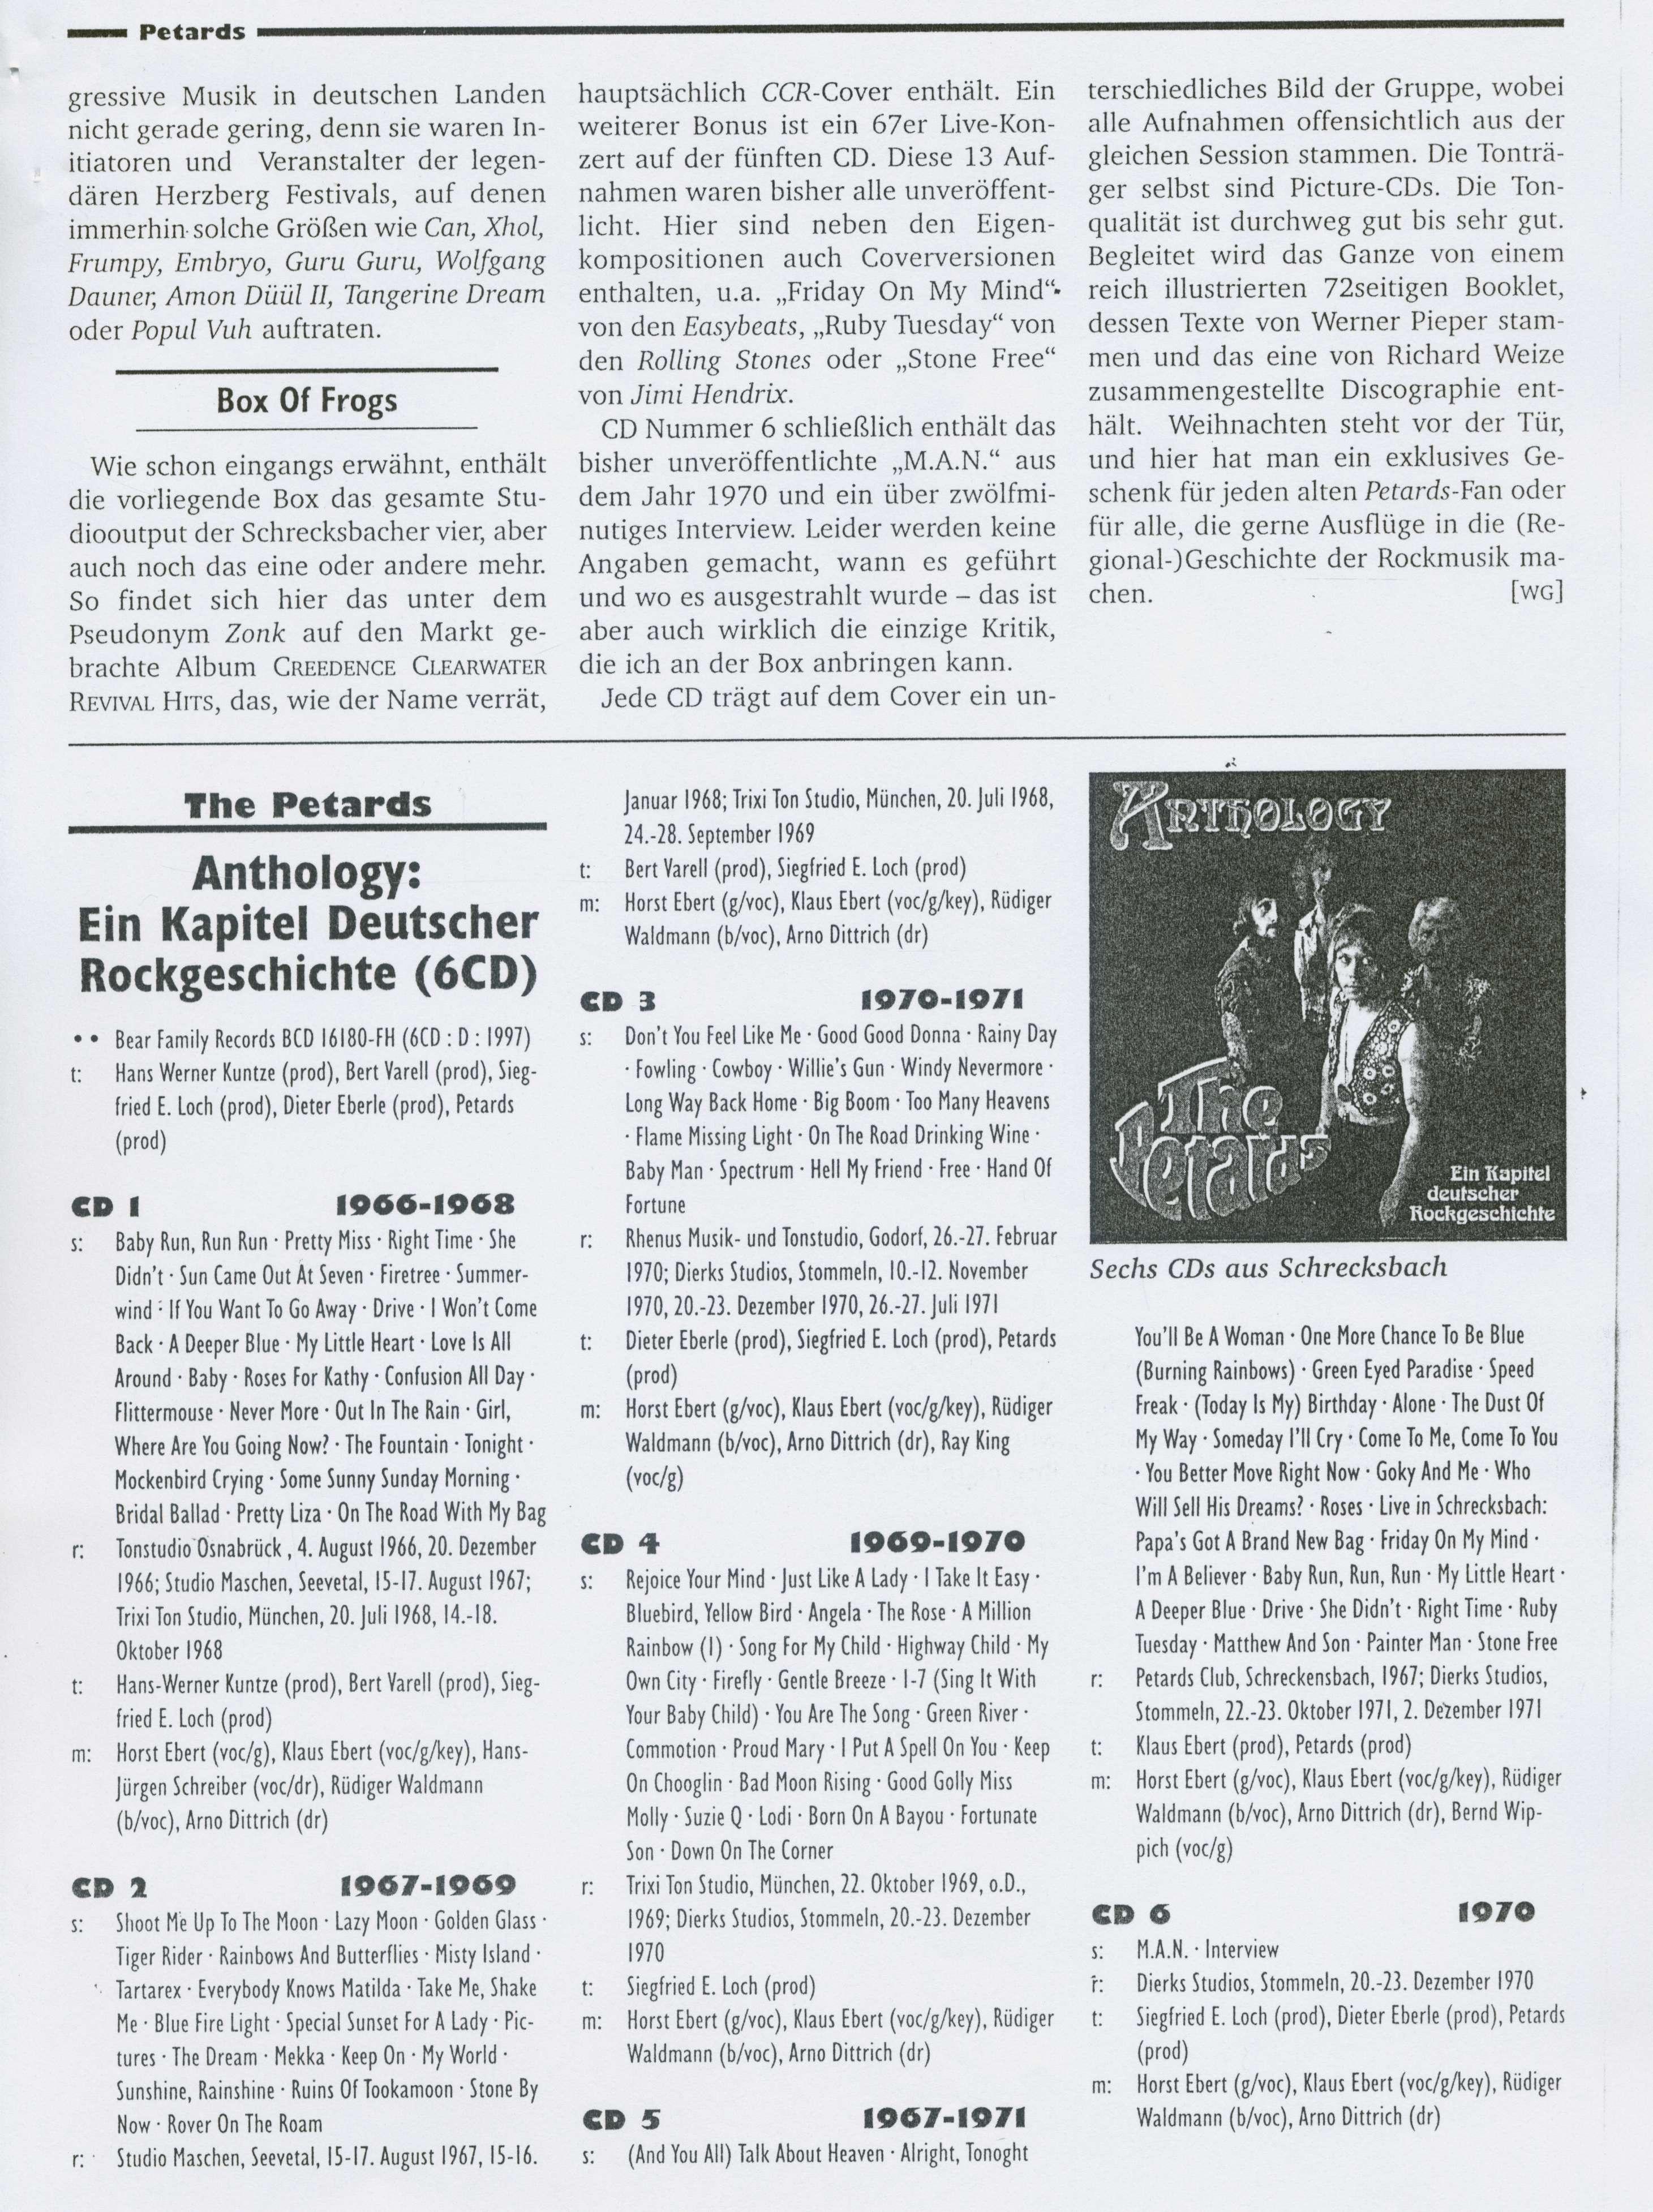 Presse Archive - The Petards - Anthology - Rock & Pop Sammlung